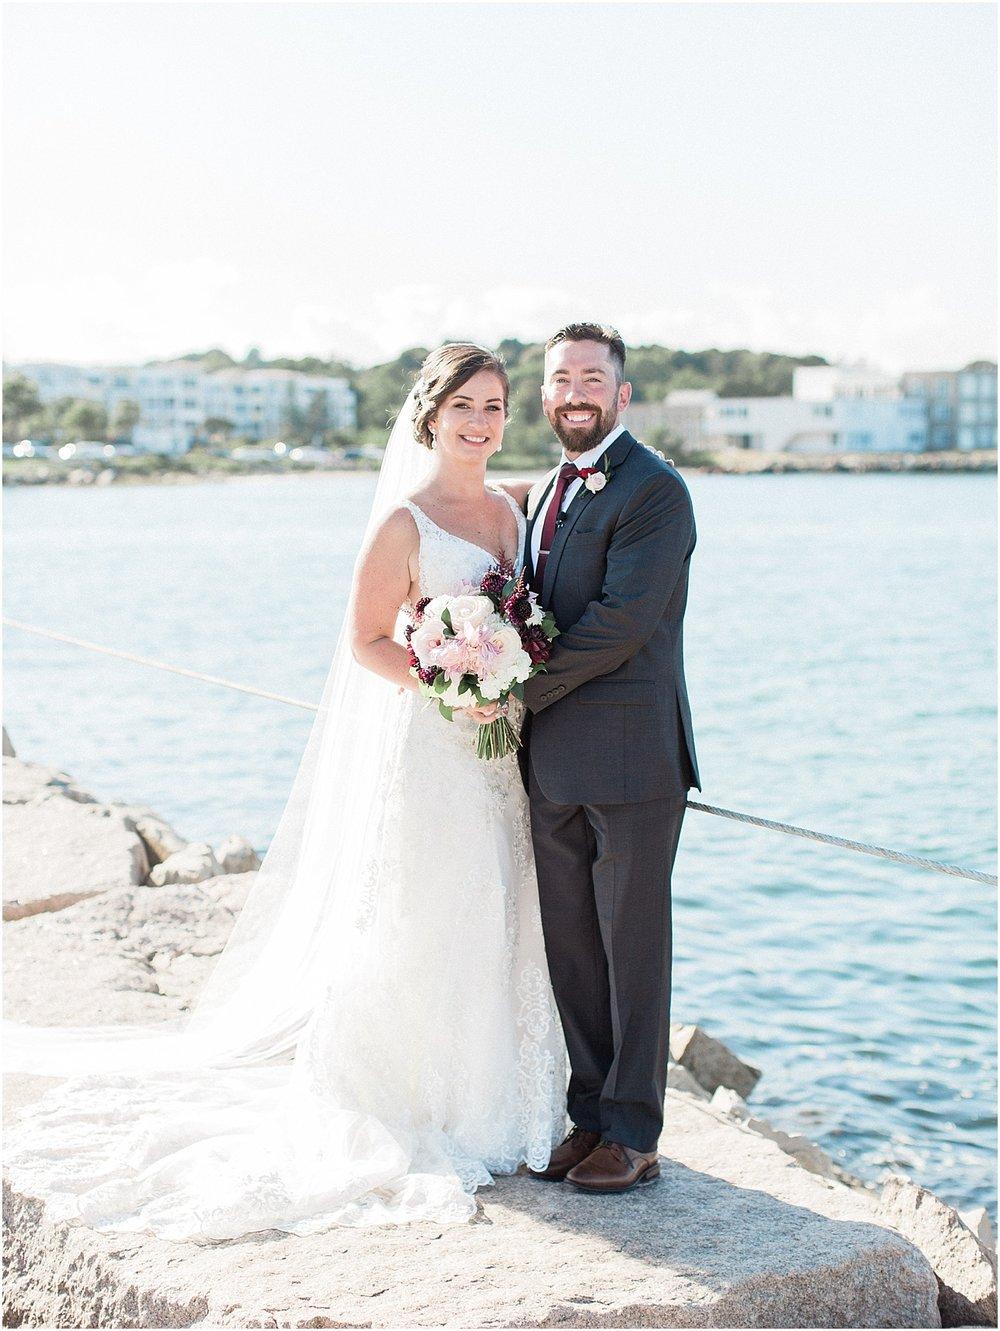 kim_matt_indian_pond_country_club_fall_burgundy_cape_cod_boston_wedding_photographer_meredith_jane_photography_photo_0985.jpg